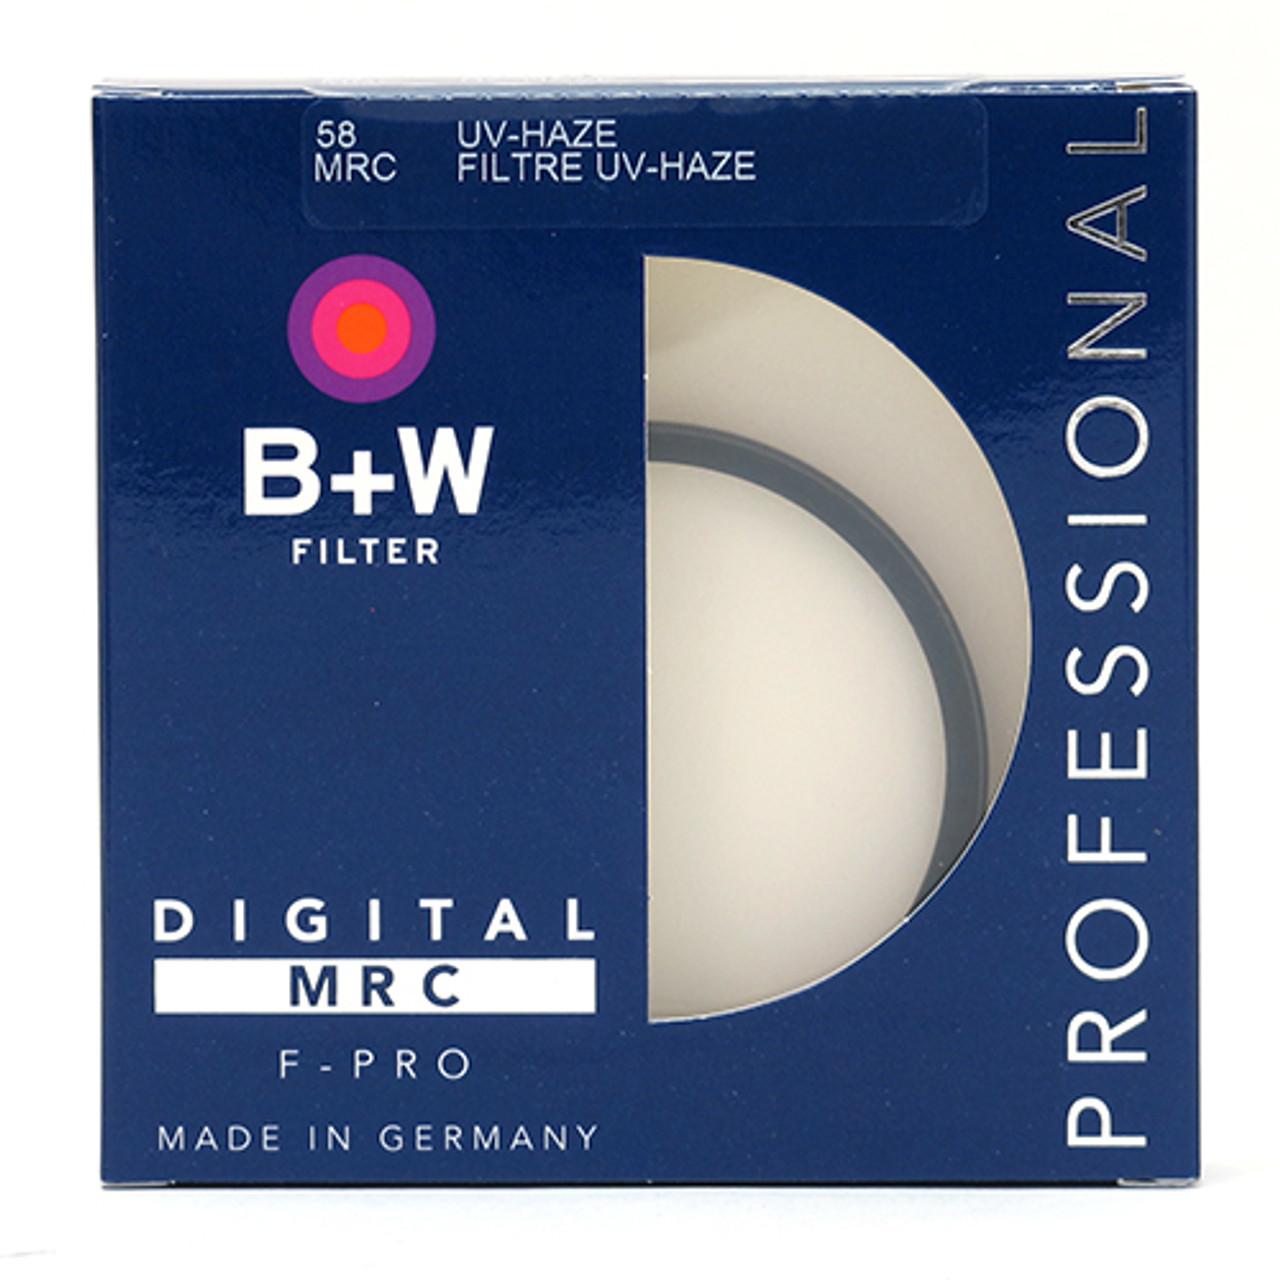 B+W SKYLIGHT KR1.5 (1A)(58MM)